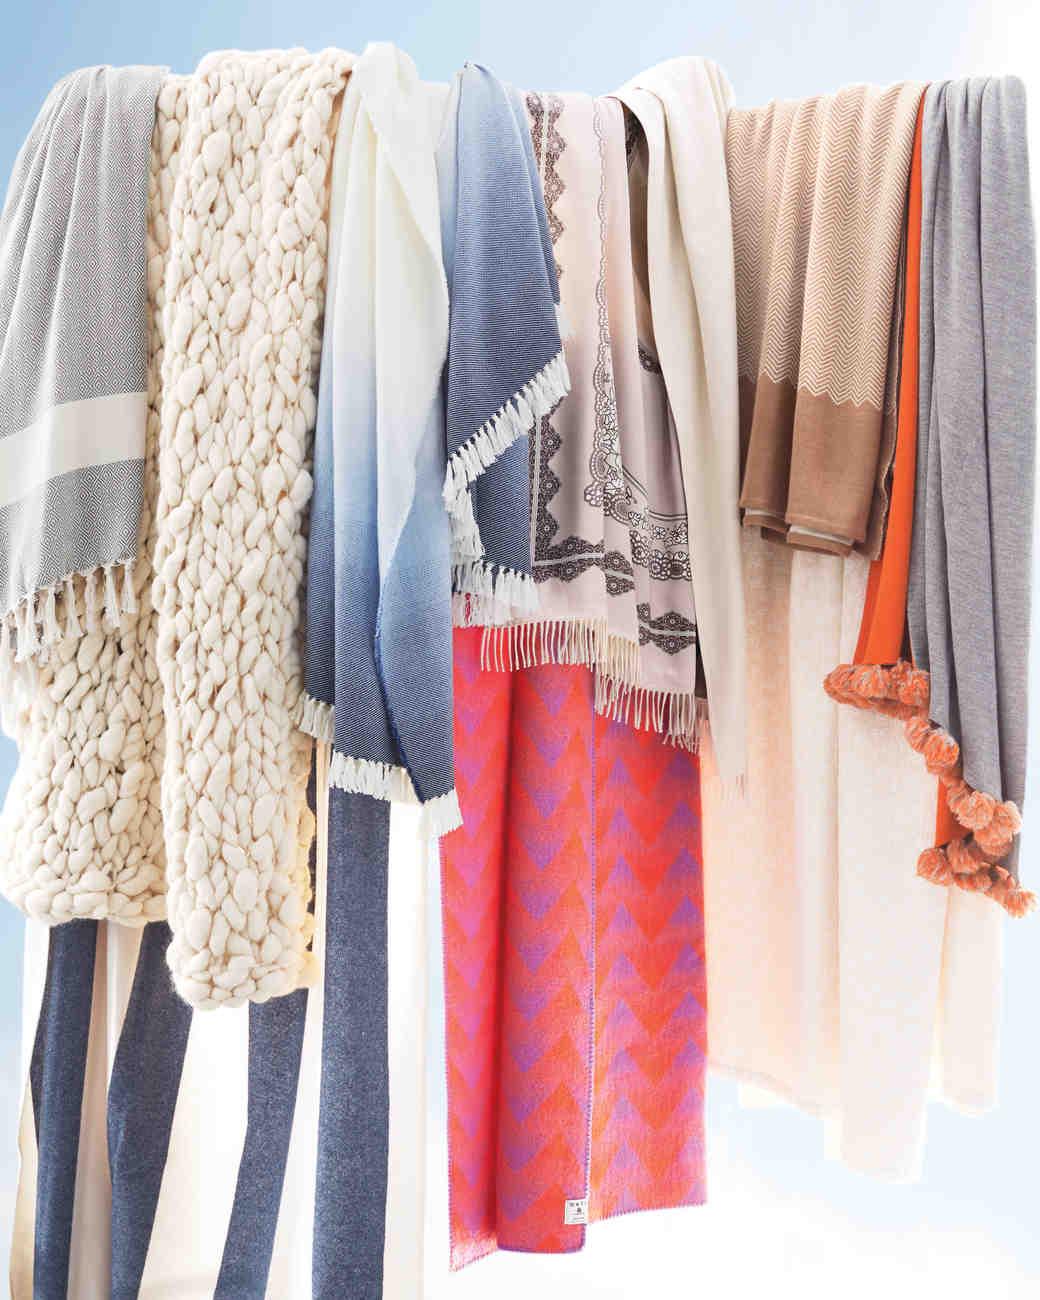 bedding-throws-blankets-026-d111040-comp.jpg